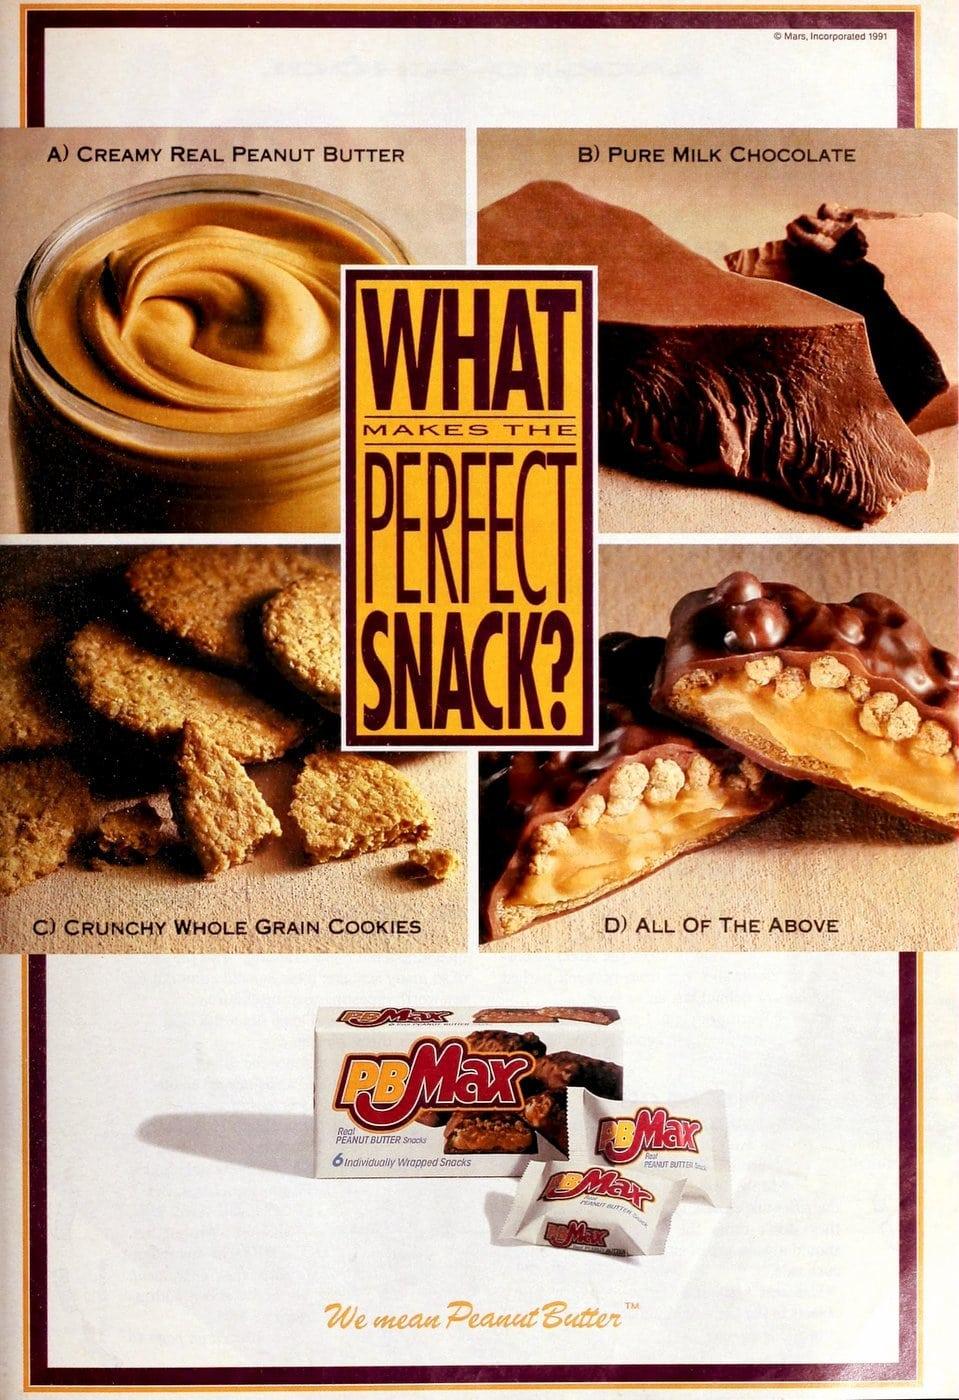 Mars PBMax peanut butter candy bars (1991)